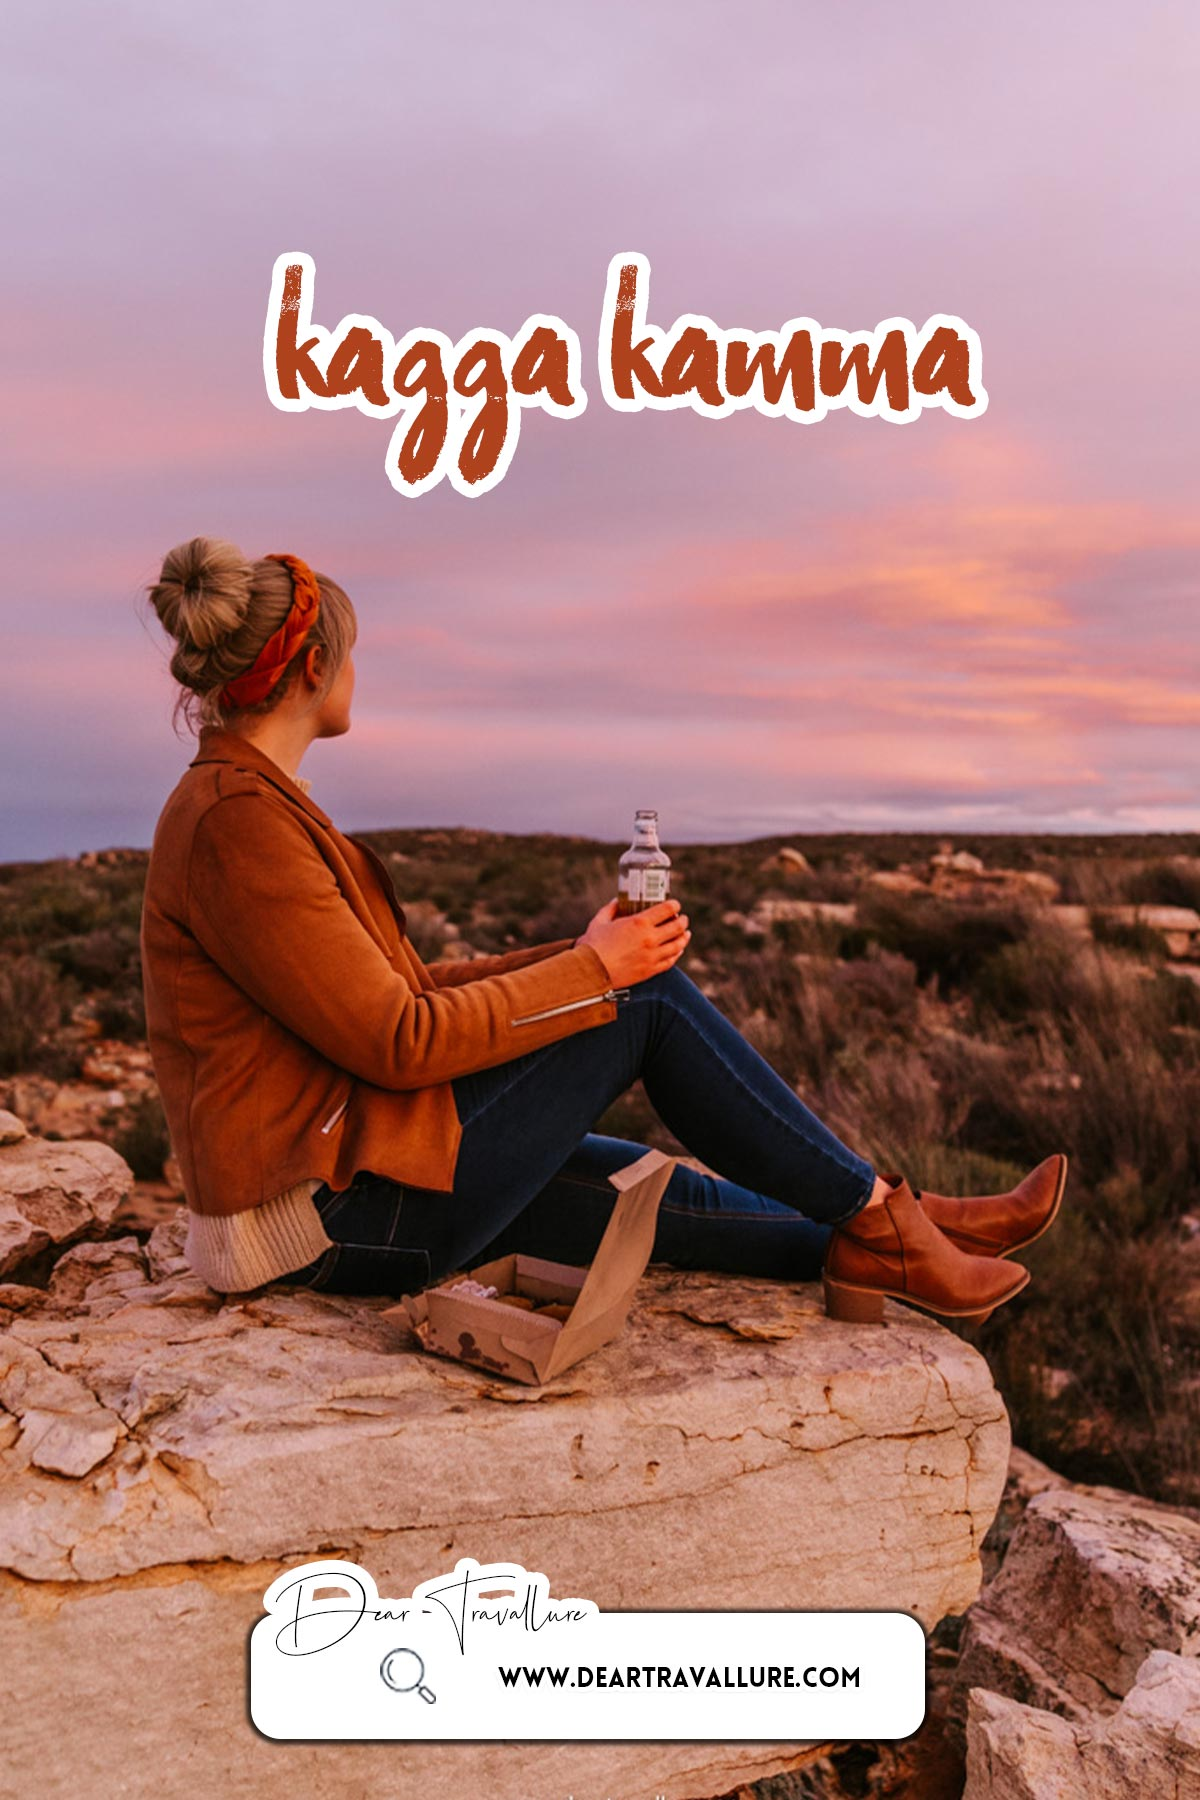 Kagga Kamma Pinterest Image 2